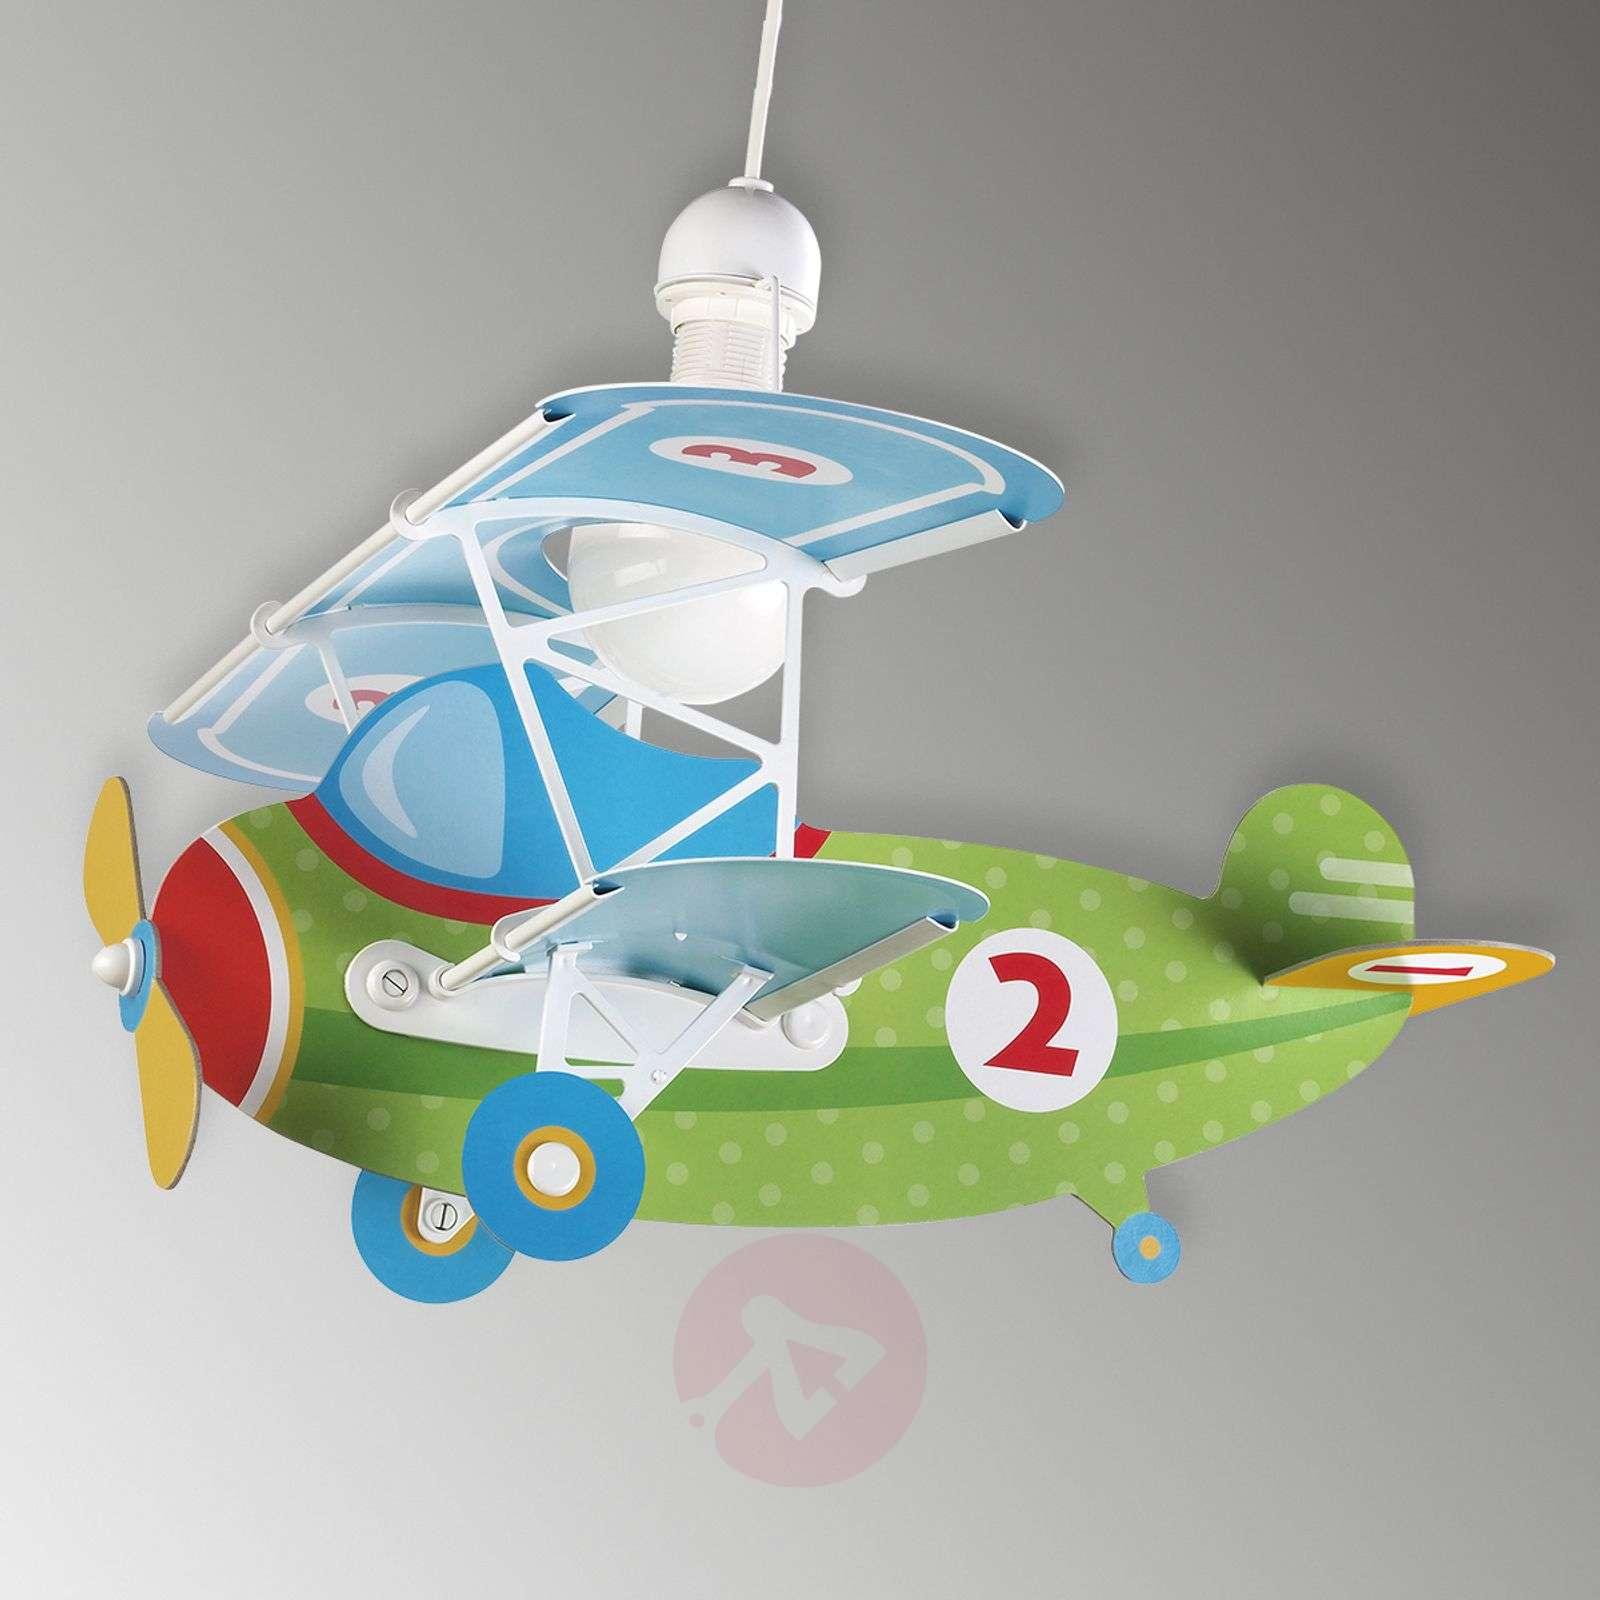 Lentokoneaiheinen riippuvalaisin Baby Plane-2507356-01